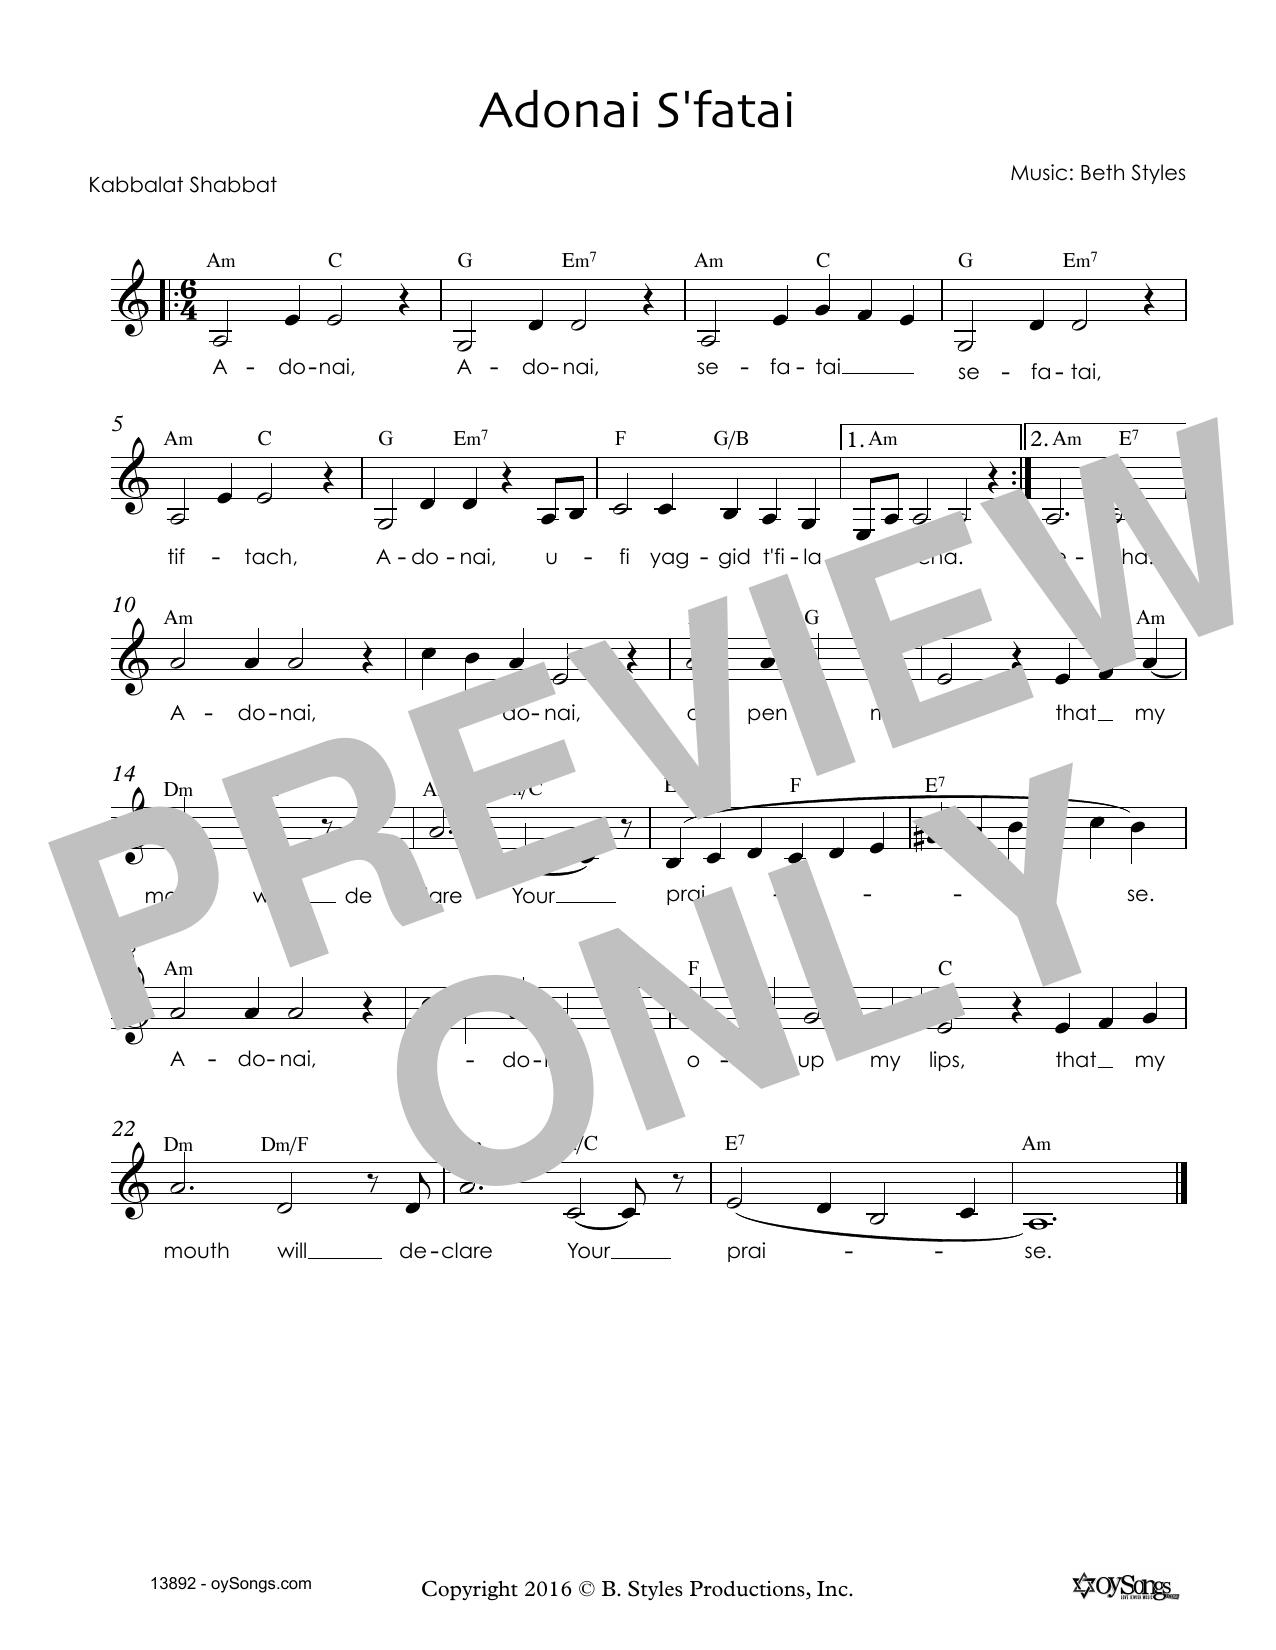 Beth Styles Adonai S'fatai sheet music notes and chords. Download Printable PDF.